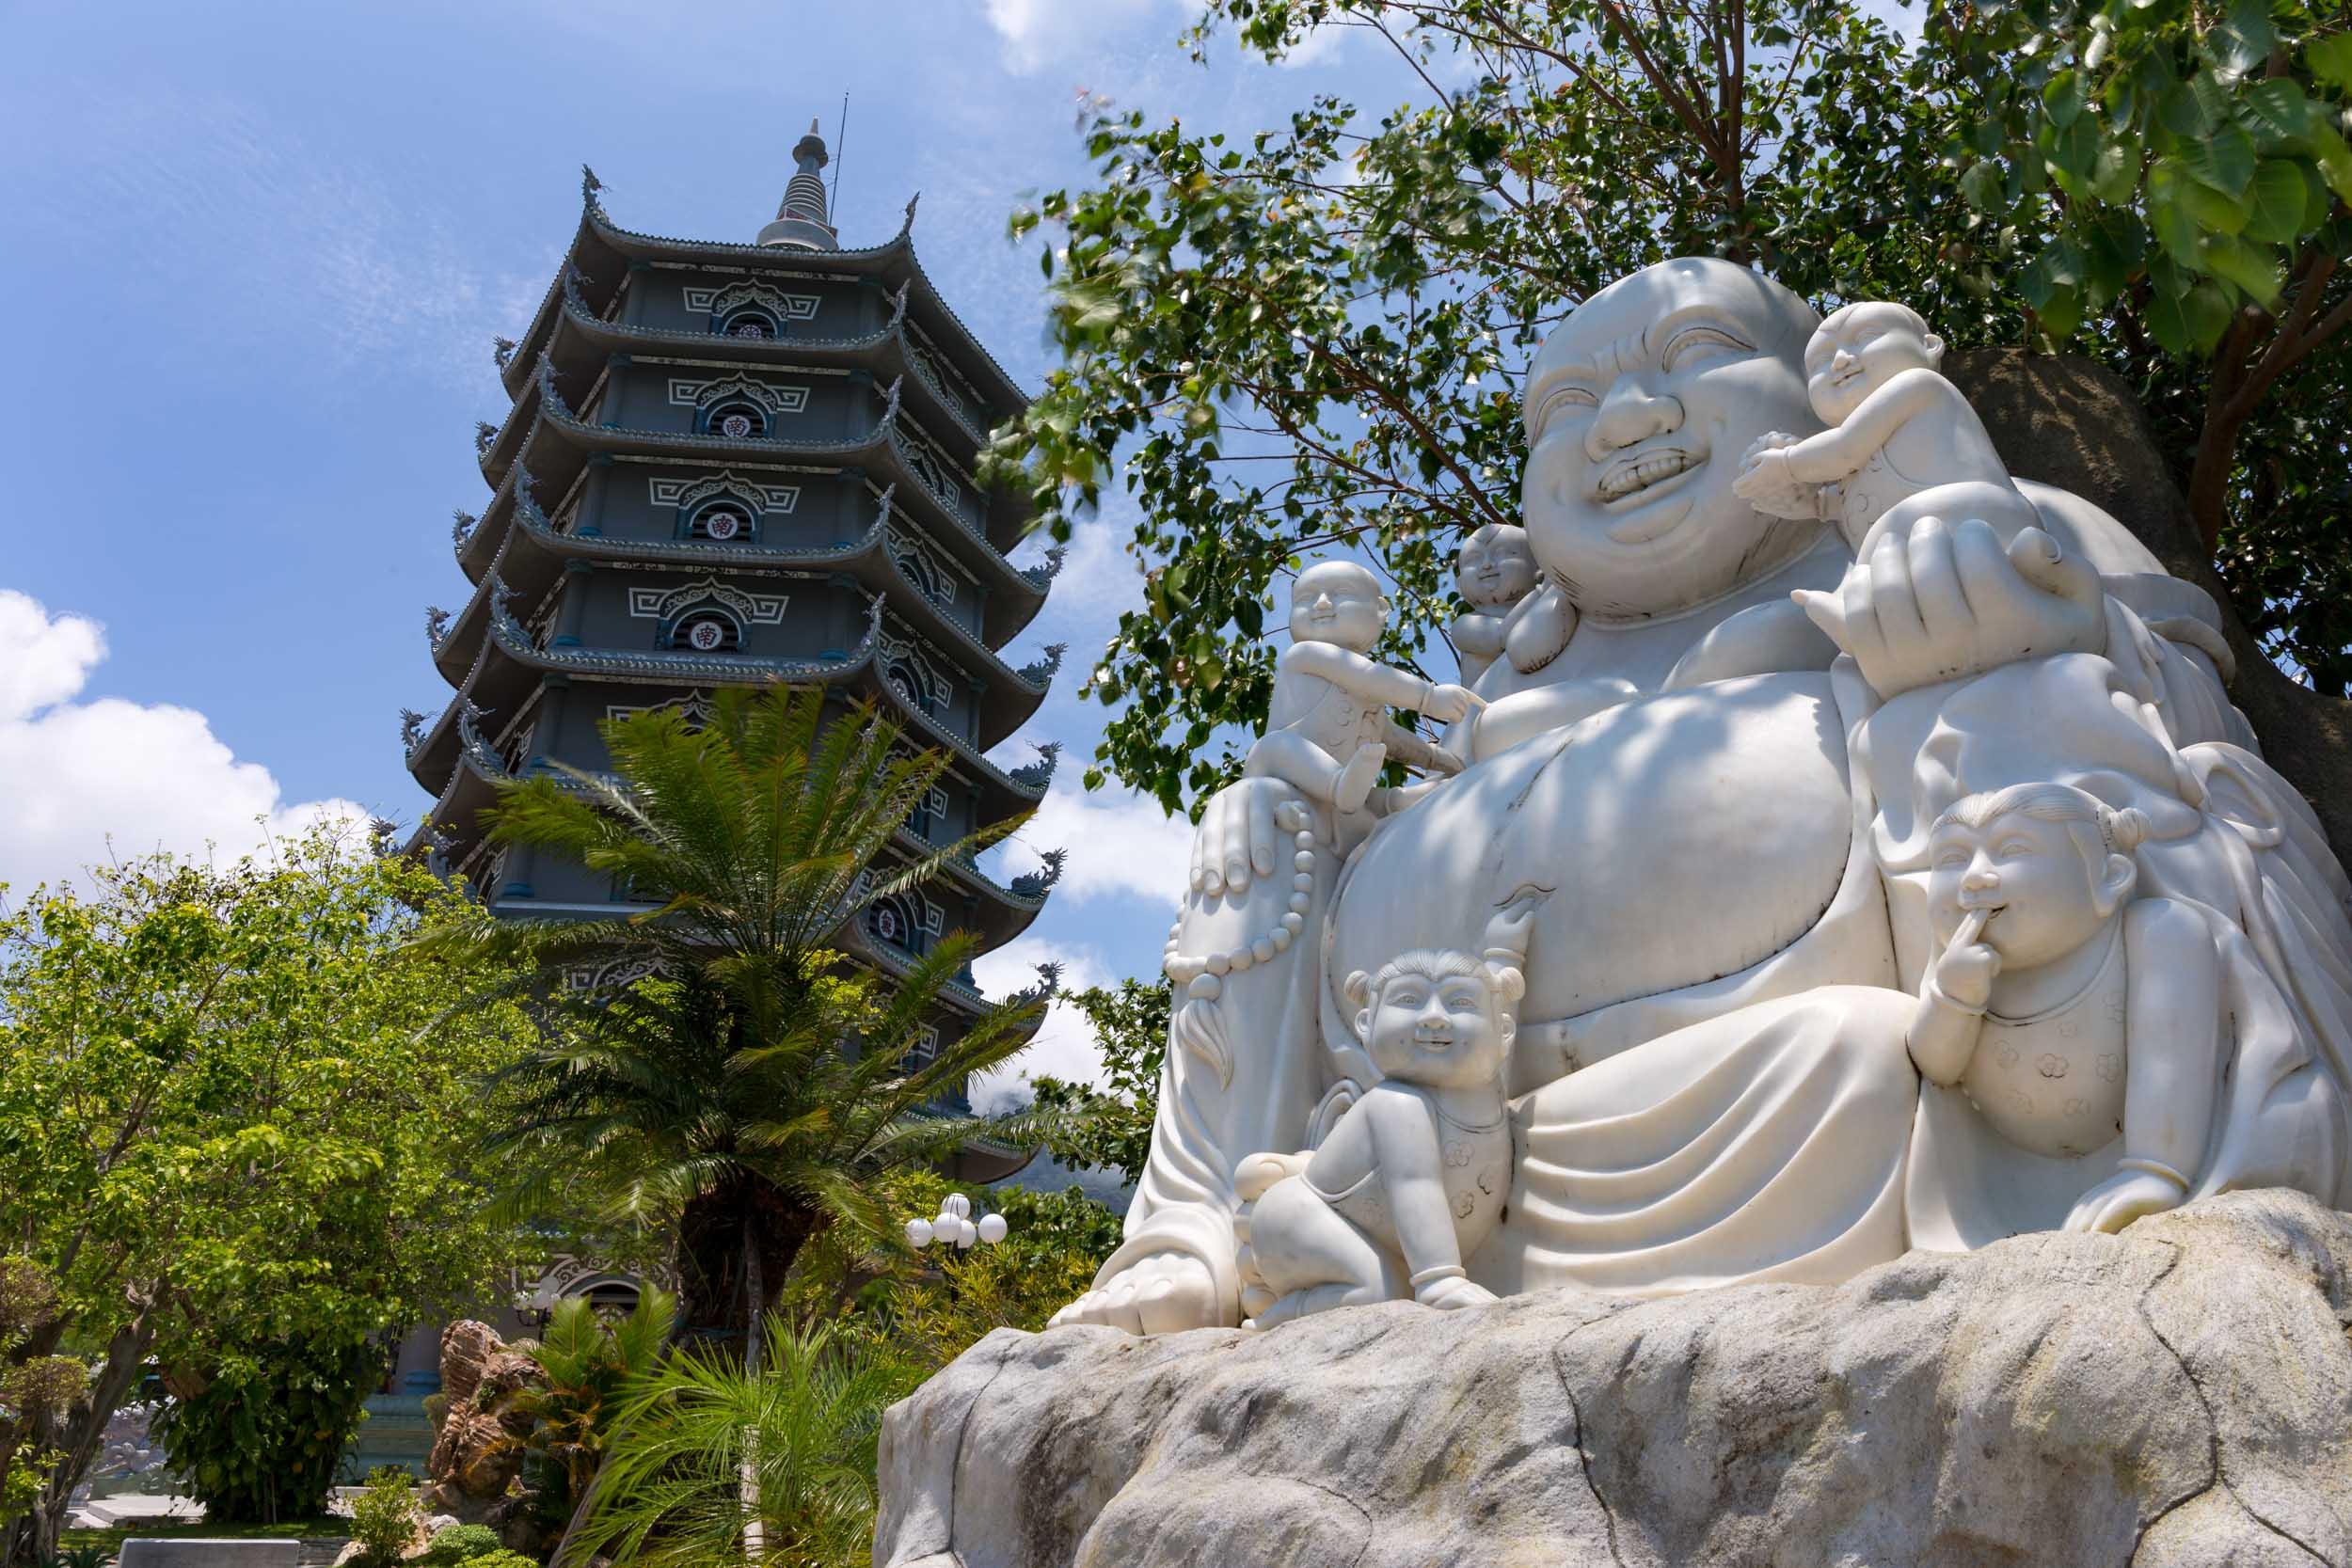 Giant Pagoda, Son Tra, Da Nang, Vietnam.